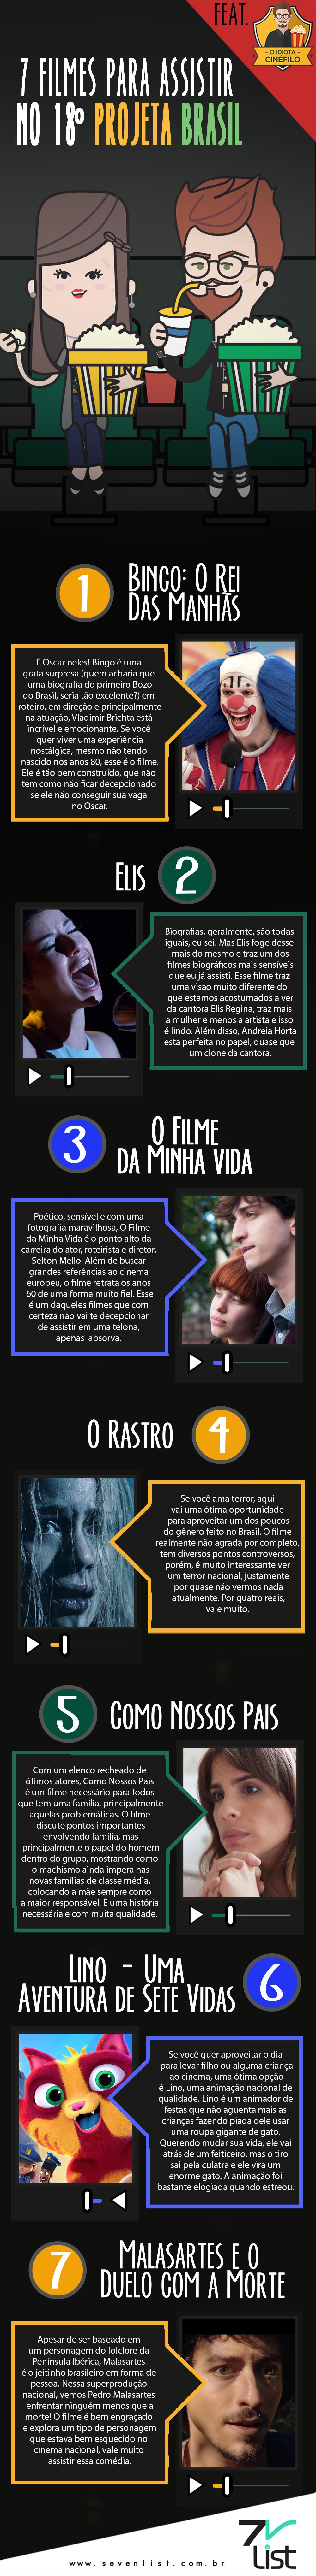 22fe21d79b664 7 filmes para assistir no 18º Projeta Brasil